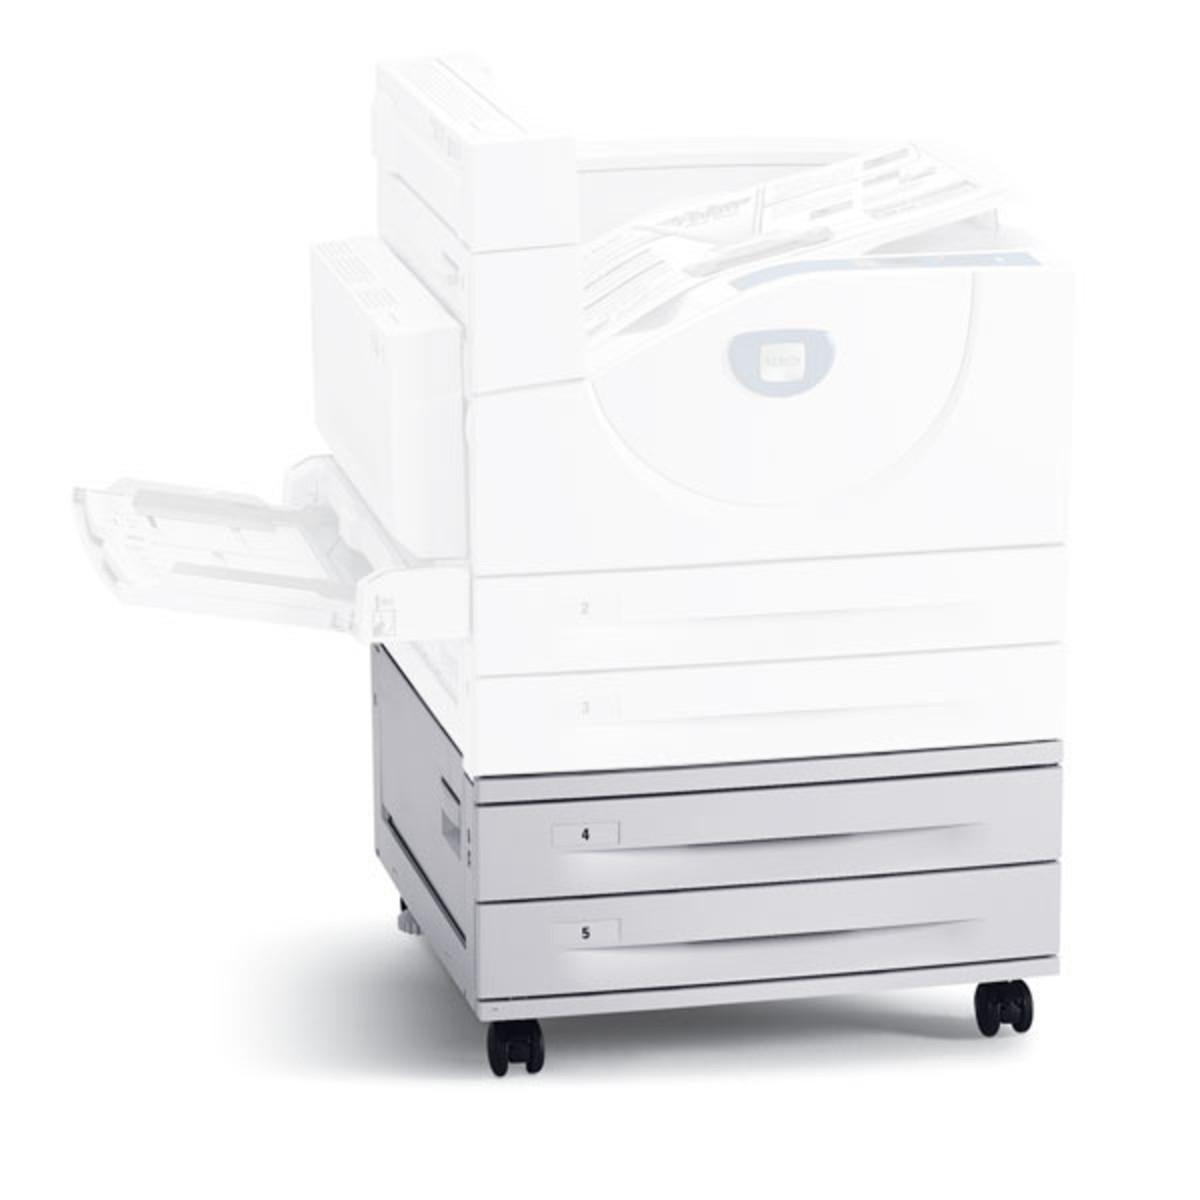 Xerox 1000 Sheet Feeder Tray